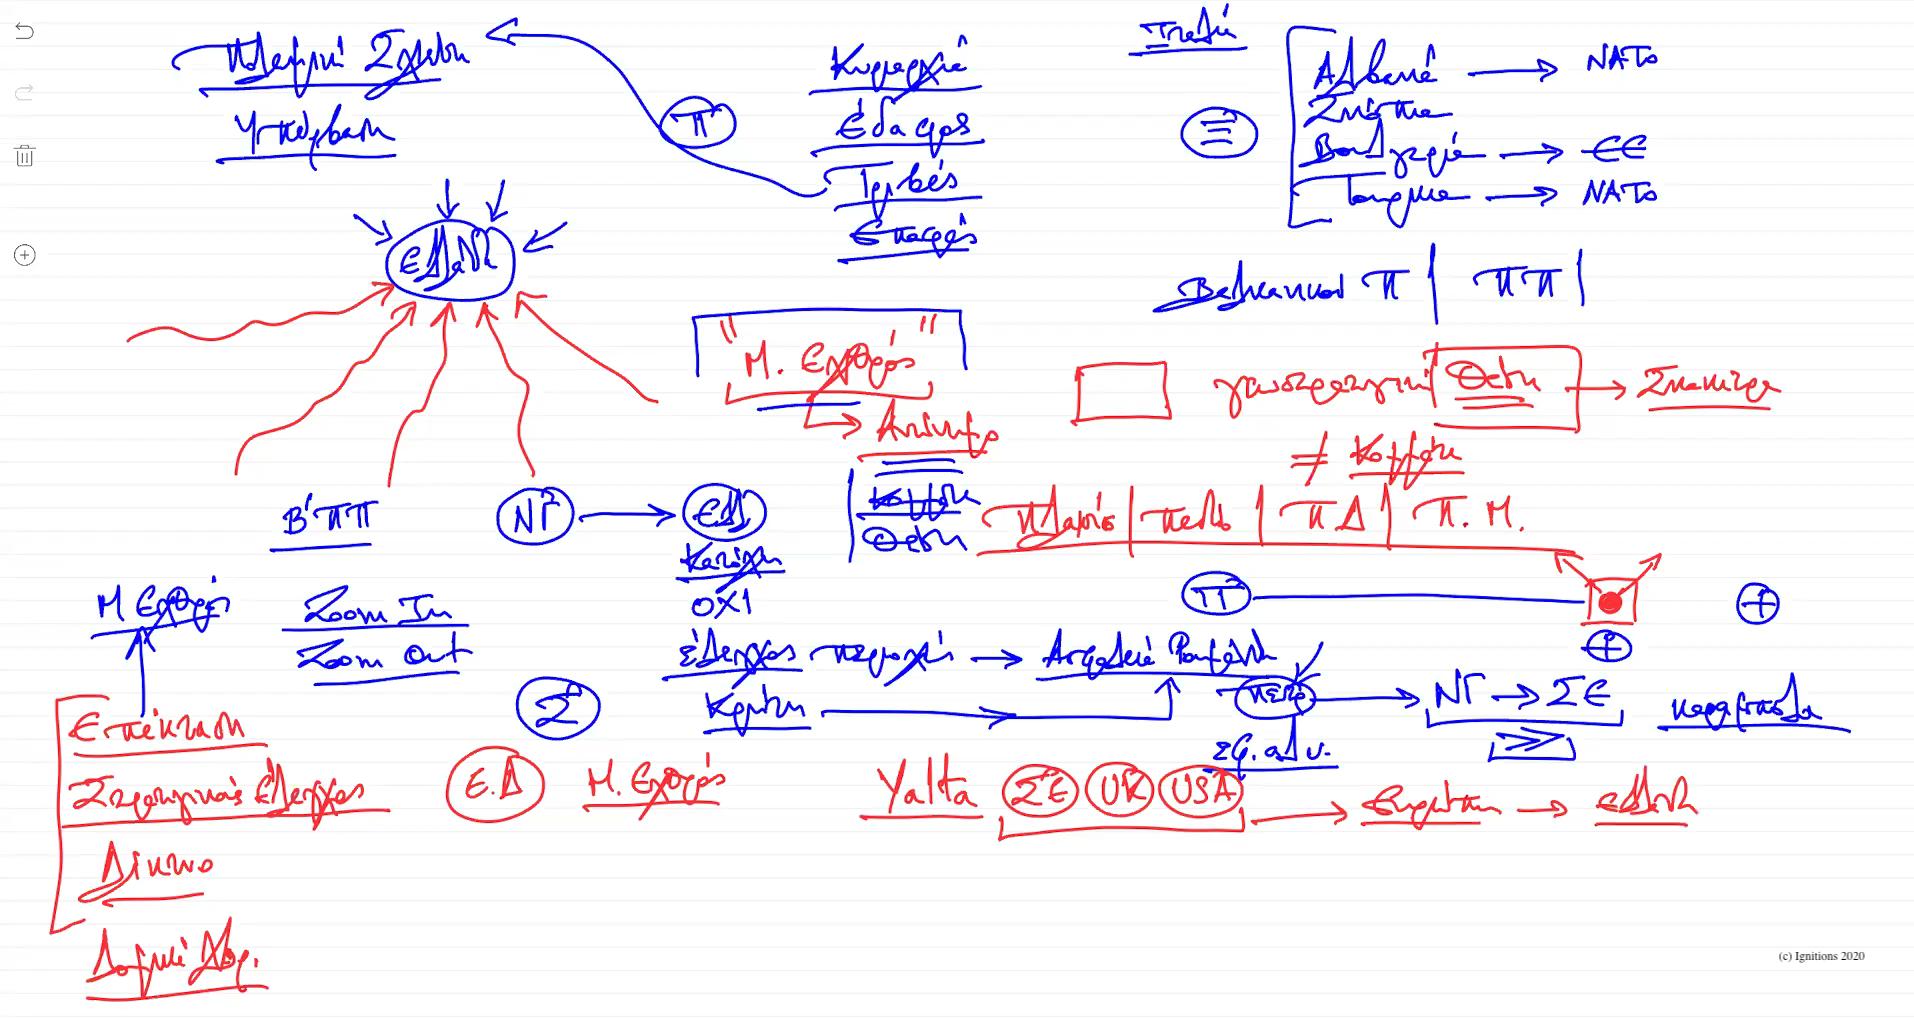 56023 - XIII - e-Διάλεξη: Ελληνική Γεωστρατηγική I. (Dessin)